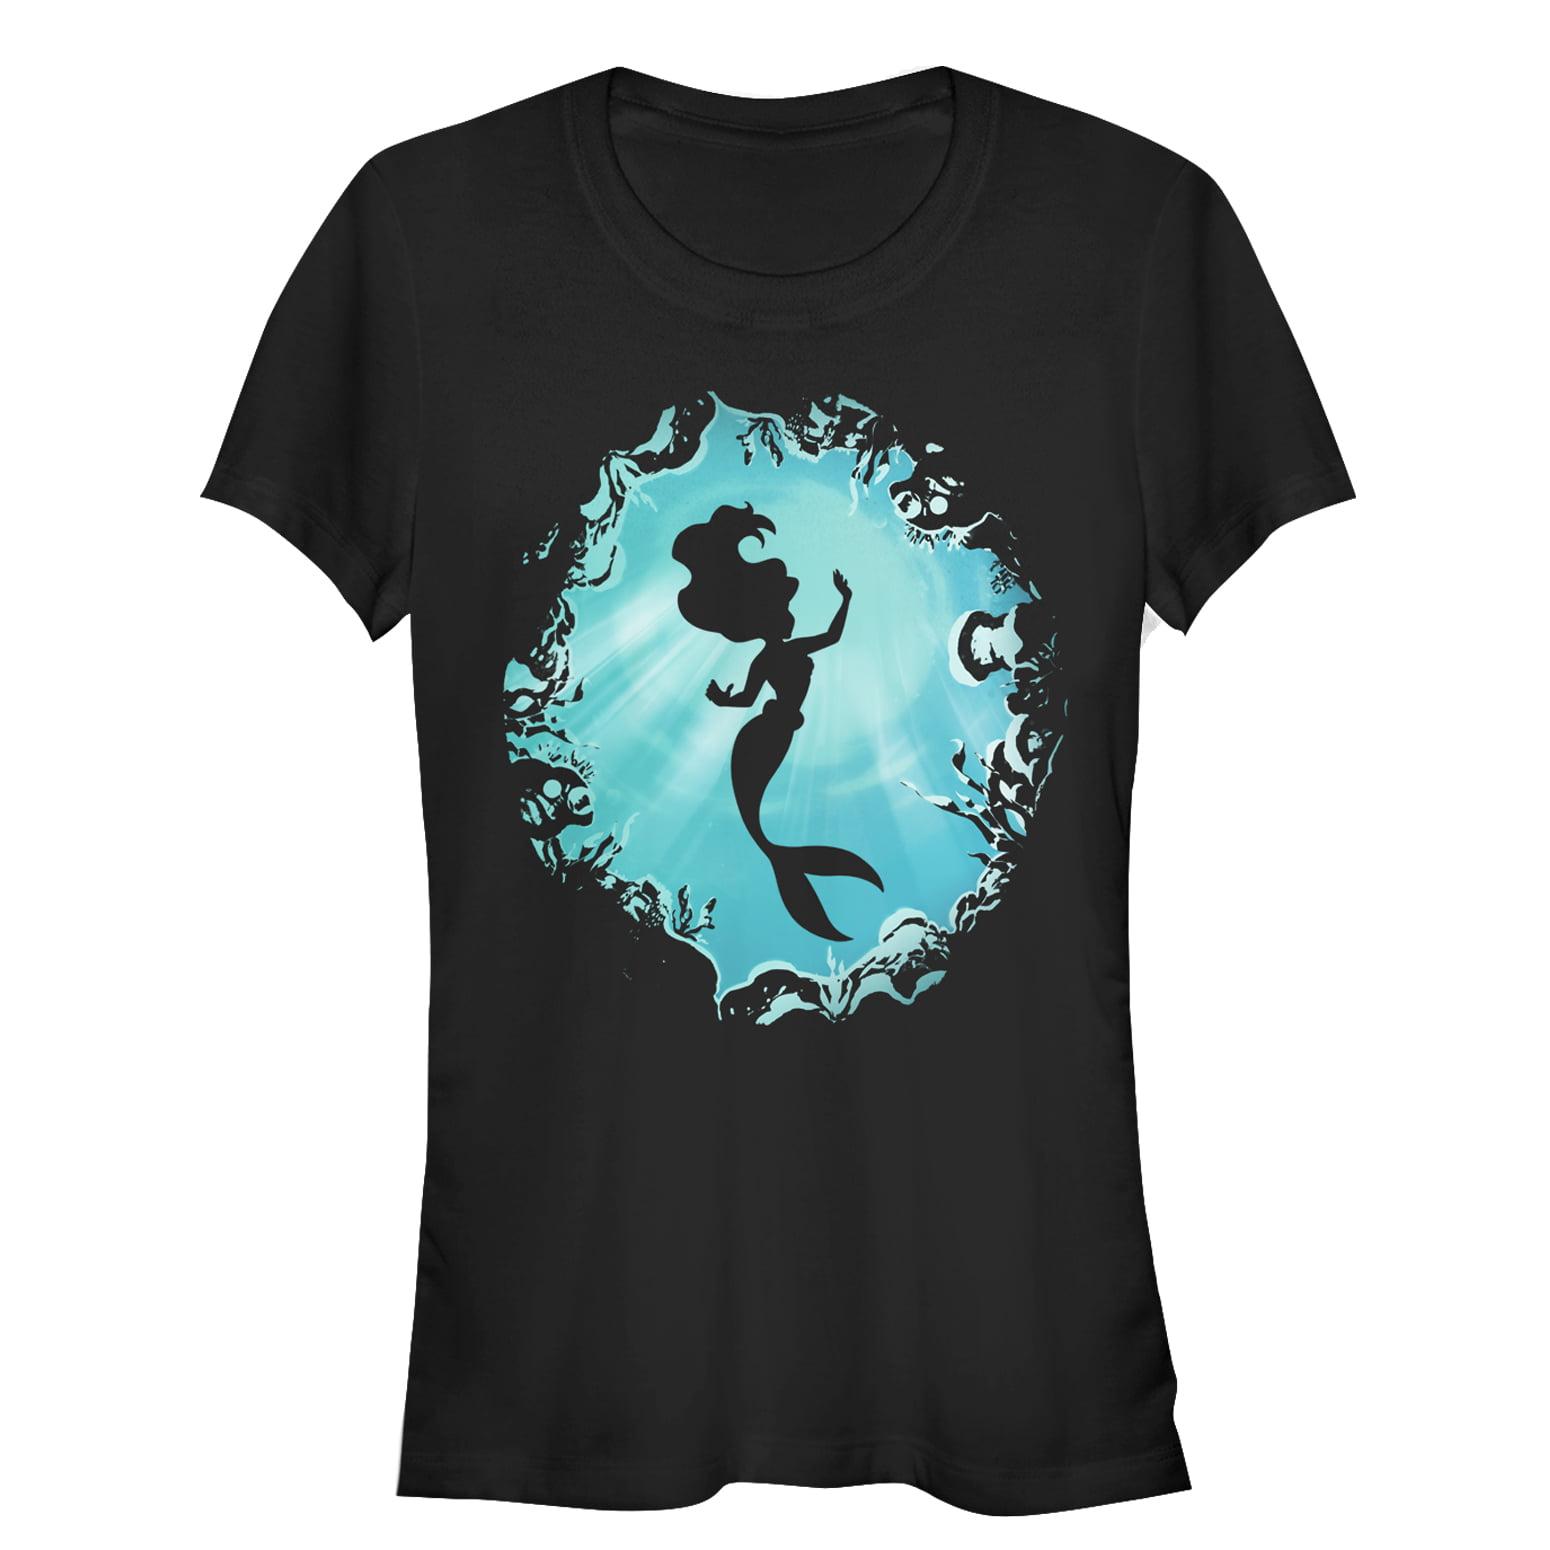 The Little Mermaid Juniors' Ariel's Grotto T-Shirt